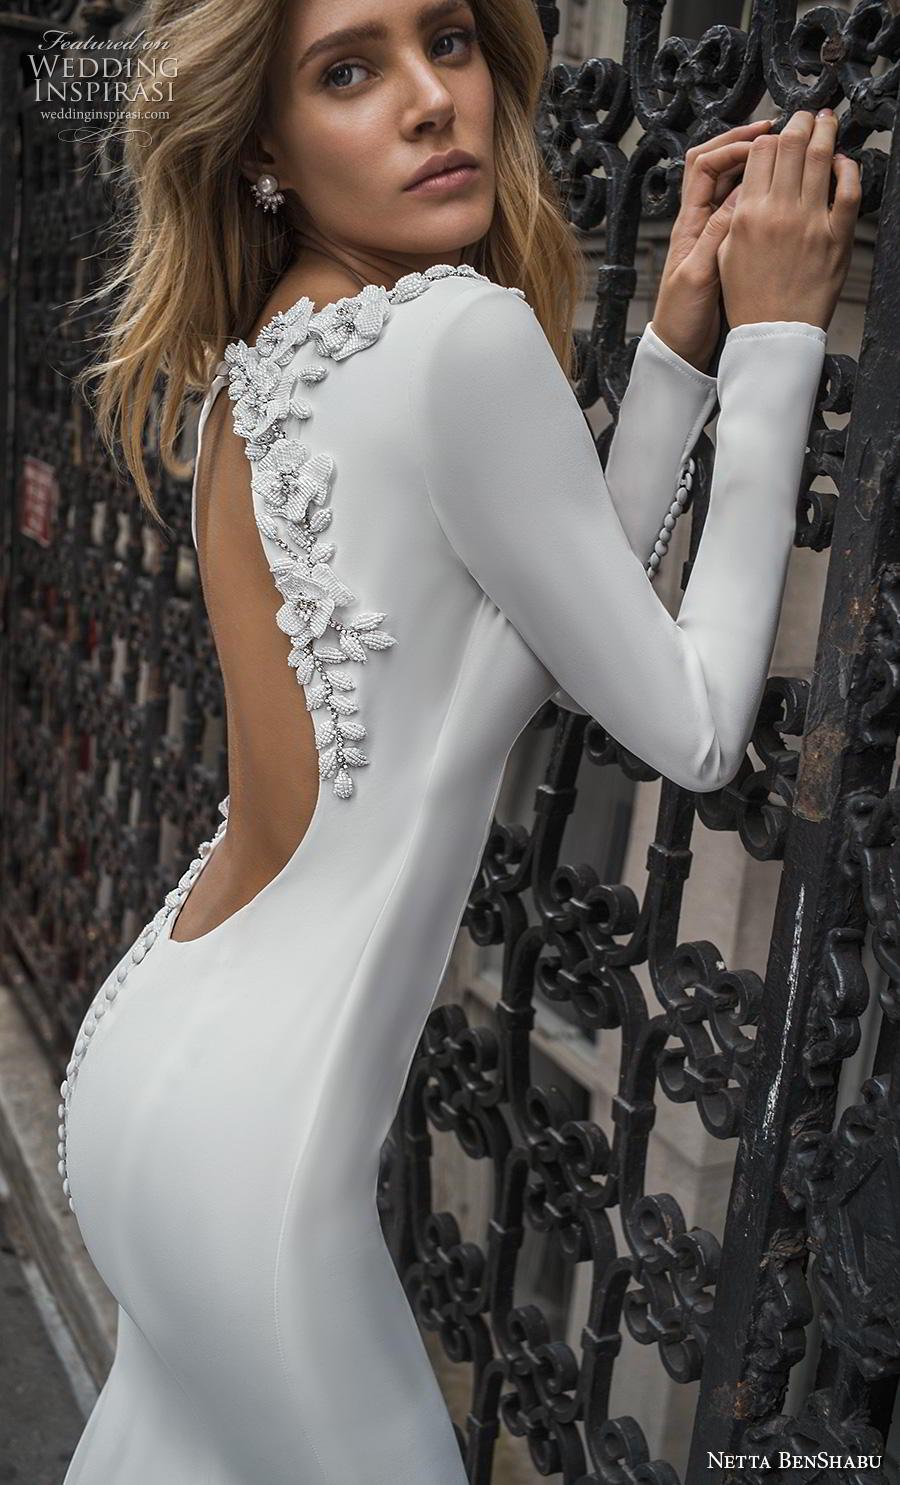 netta benshabu fall 2019 bridal long sleeves bateau neckline simple minimalist clean elegant fit and flare wedding dress low backless open back chapel train (13) zbv